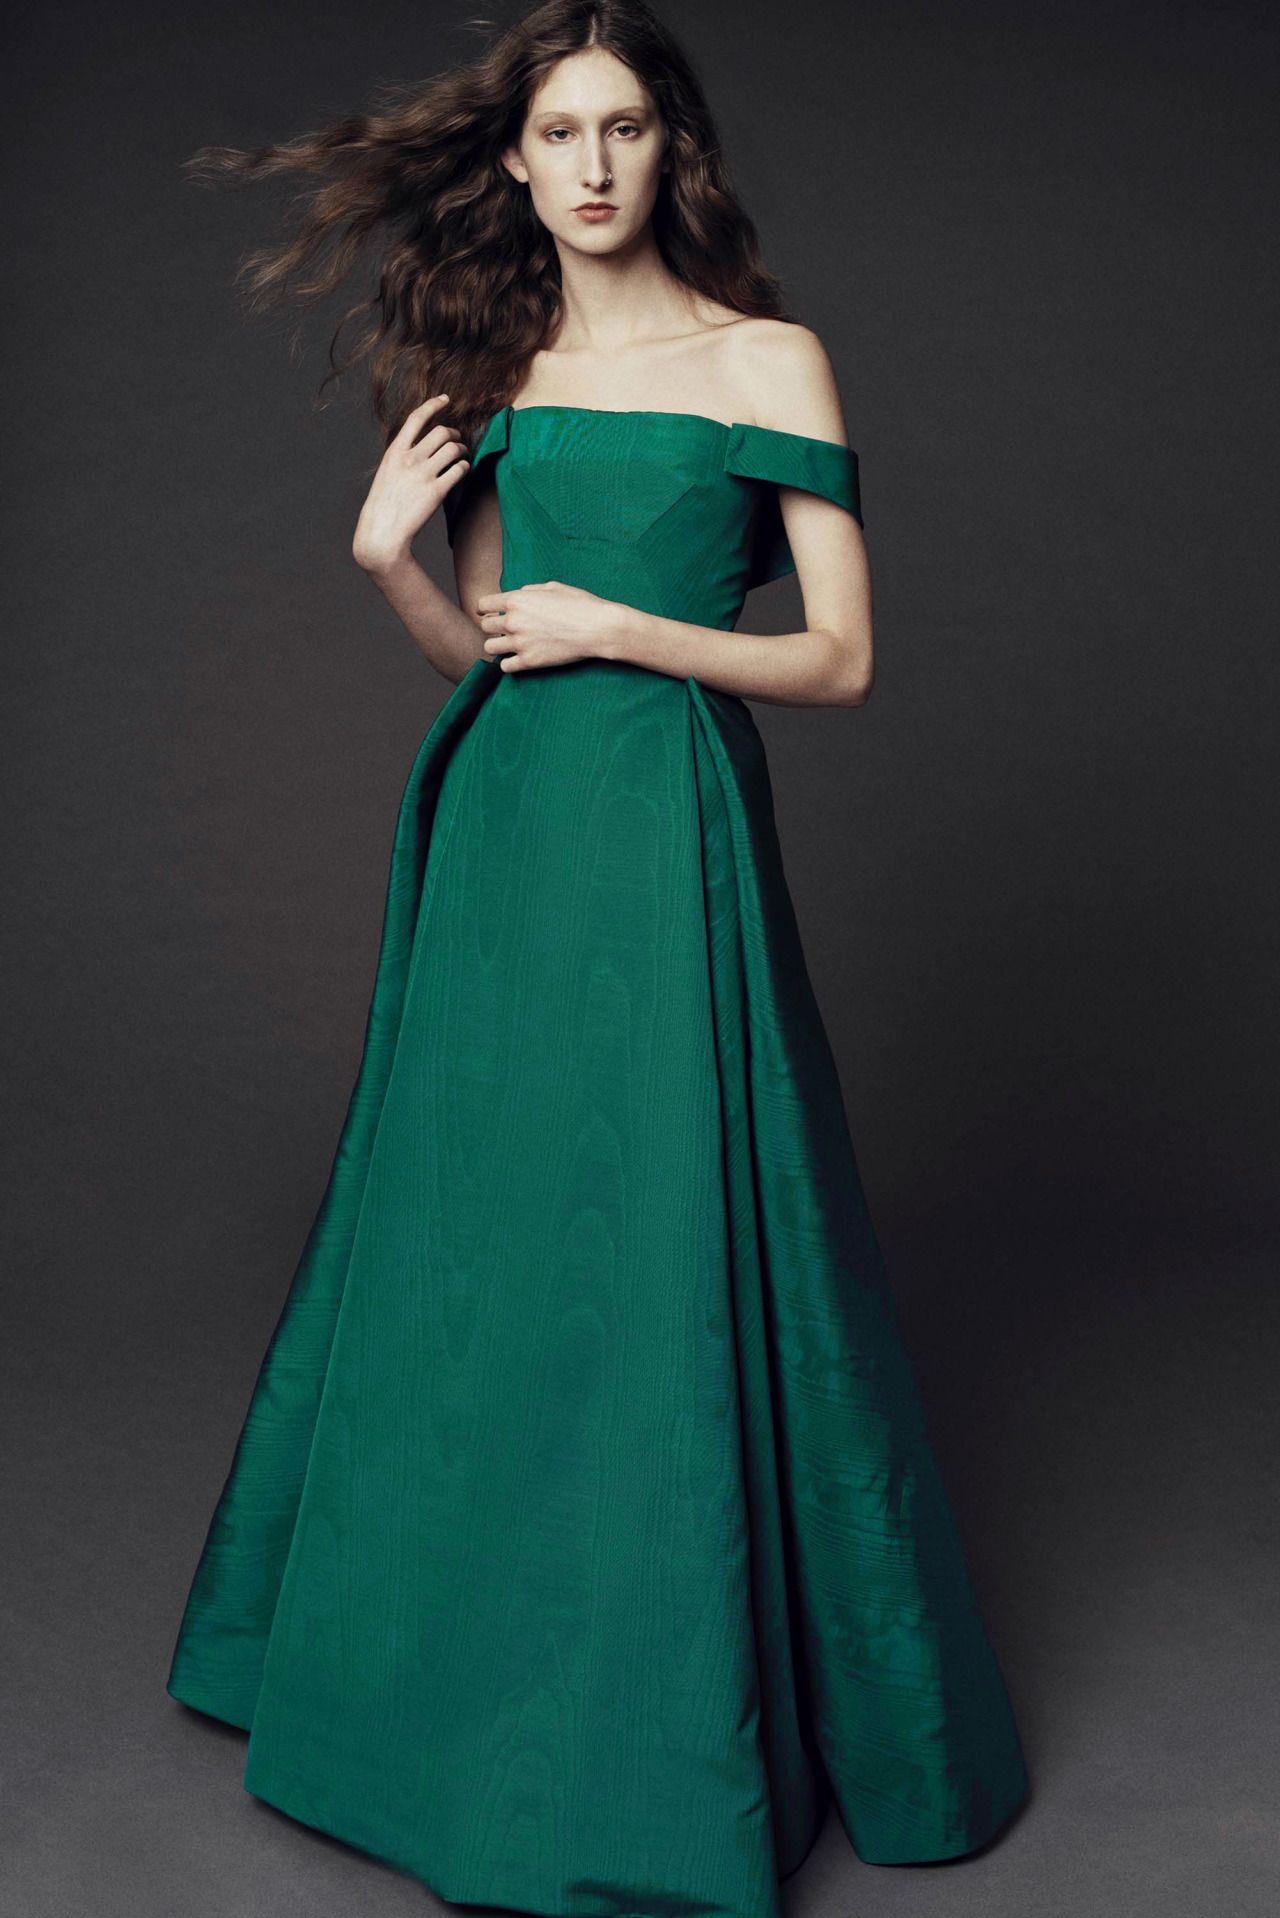 Aofclothes Green Gownladypostszac Posenwaitinggreen Dressmessages